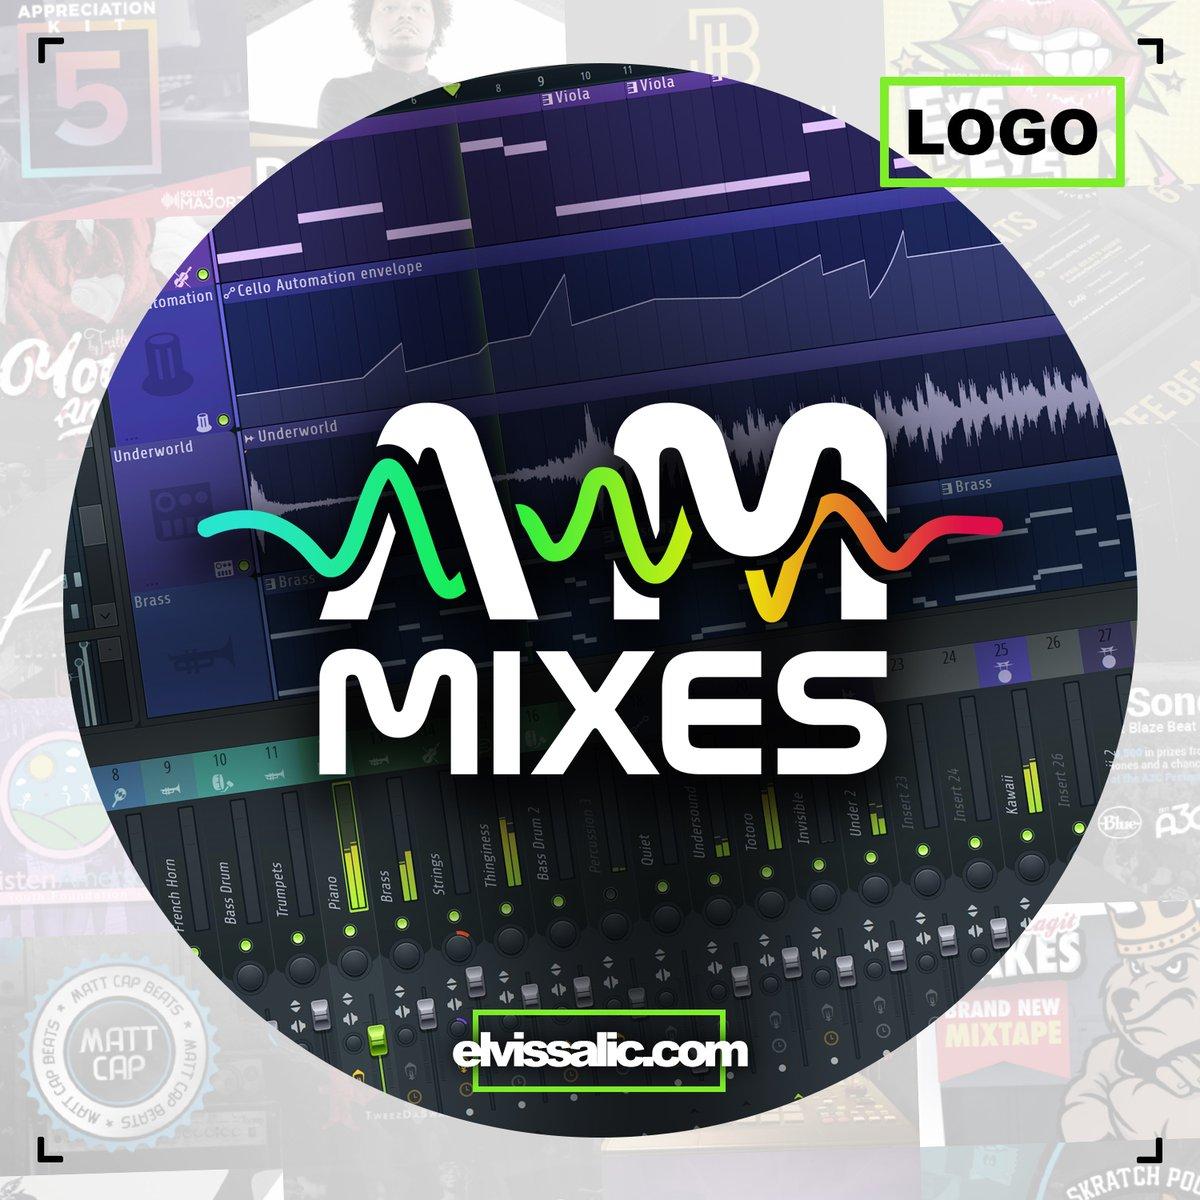 @ammixes logo development  #graphic #design #graphicdesign #illustrator #vectordesign #brandingdesign #logooftheday #logoinspiration #logodesigner #logocreation #photoshop #illustratordesign #designoftheday #audiowave #recordingstudio #mixing&mastering https://t.co/80PJzfwpQ7